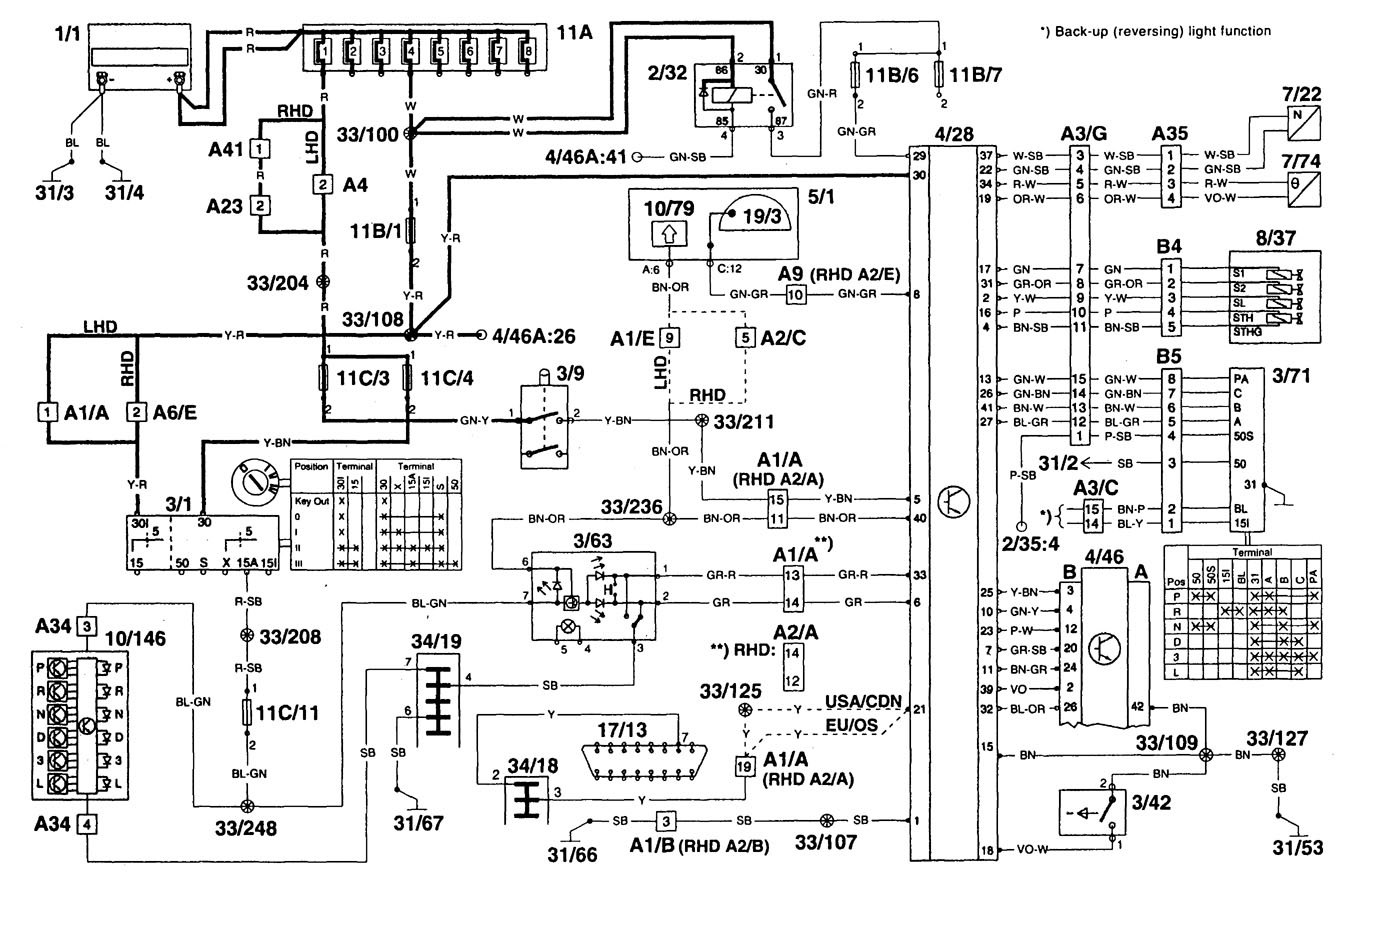 Volvo V90 (1997 - 1998) - wiring diagrams - transmission controls -  Carknowledge.info | Volvo Transmission Diagrams |  | Carknowledge.info